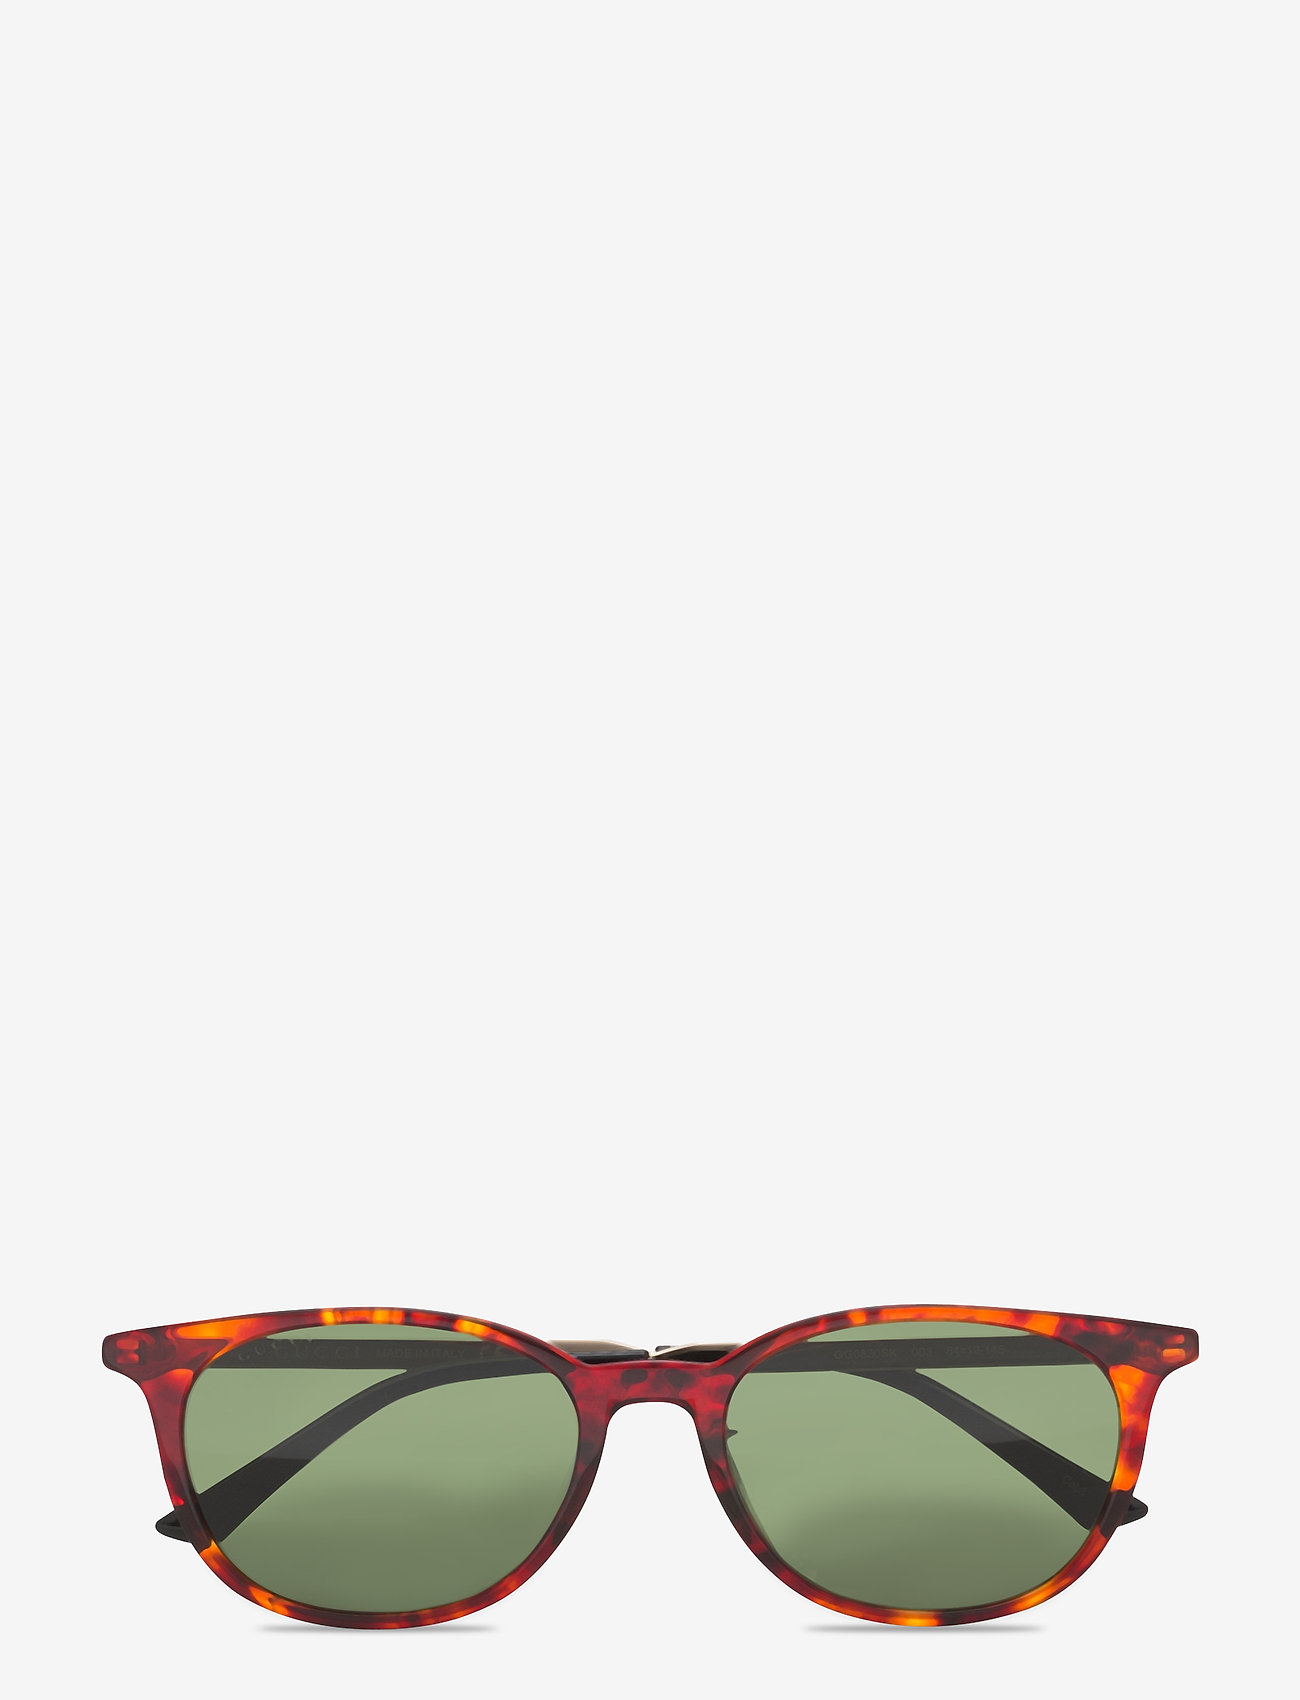 Gucci Sunglasses - GG0830SK - rund ramme - havana-gold-green - 0